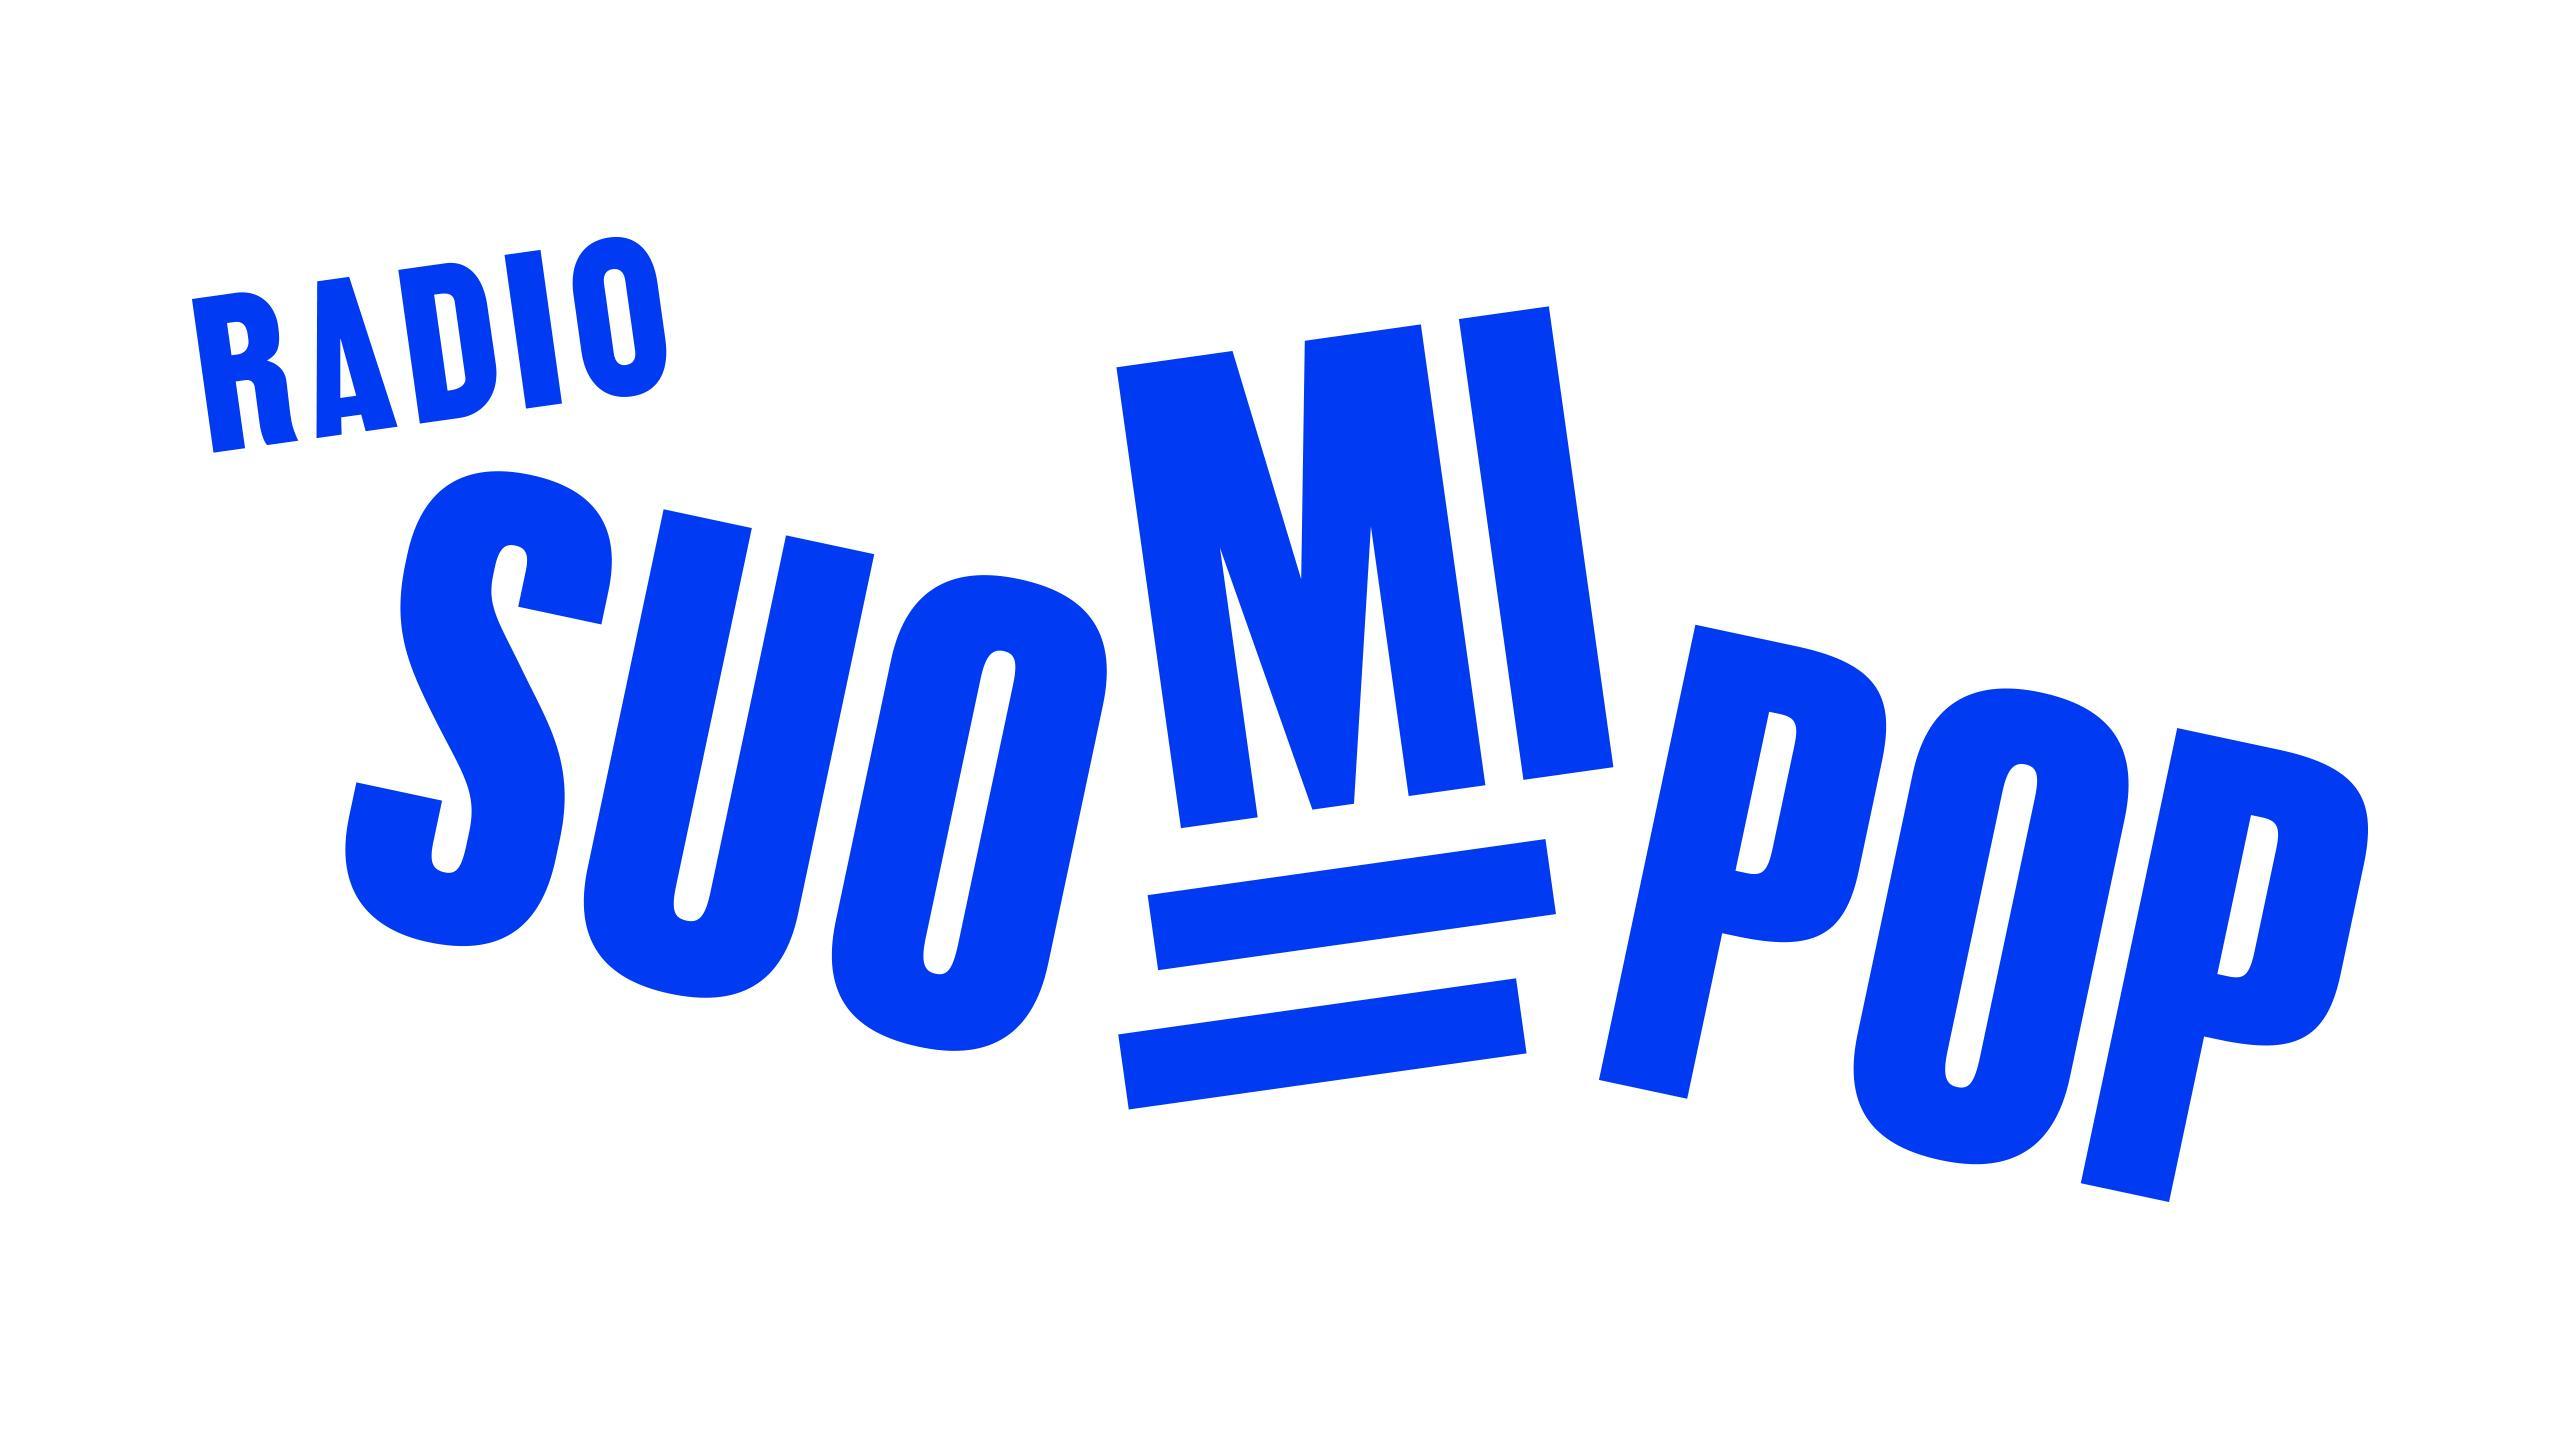 Radio Suomipop Juontajat